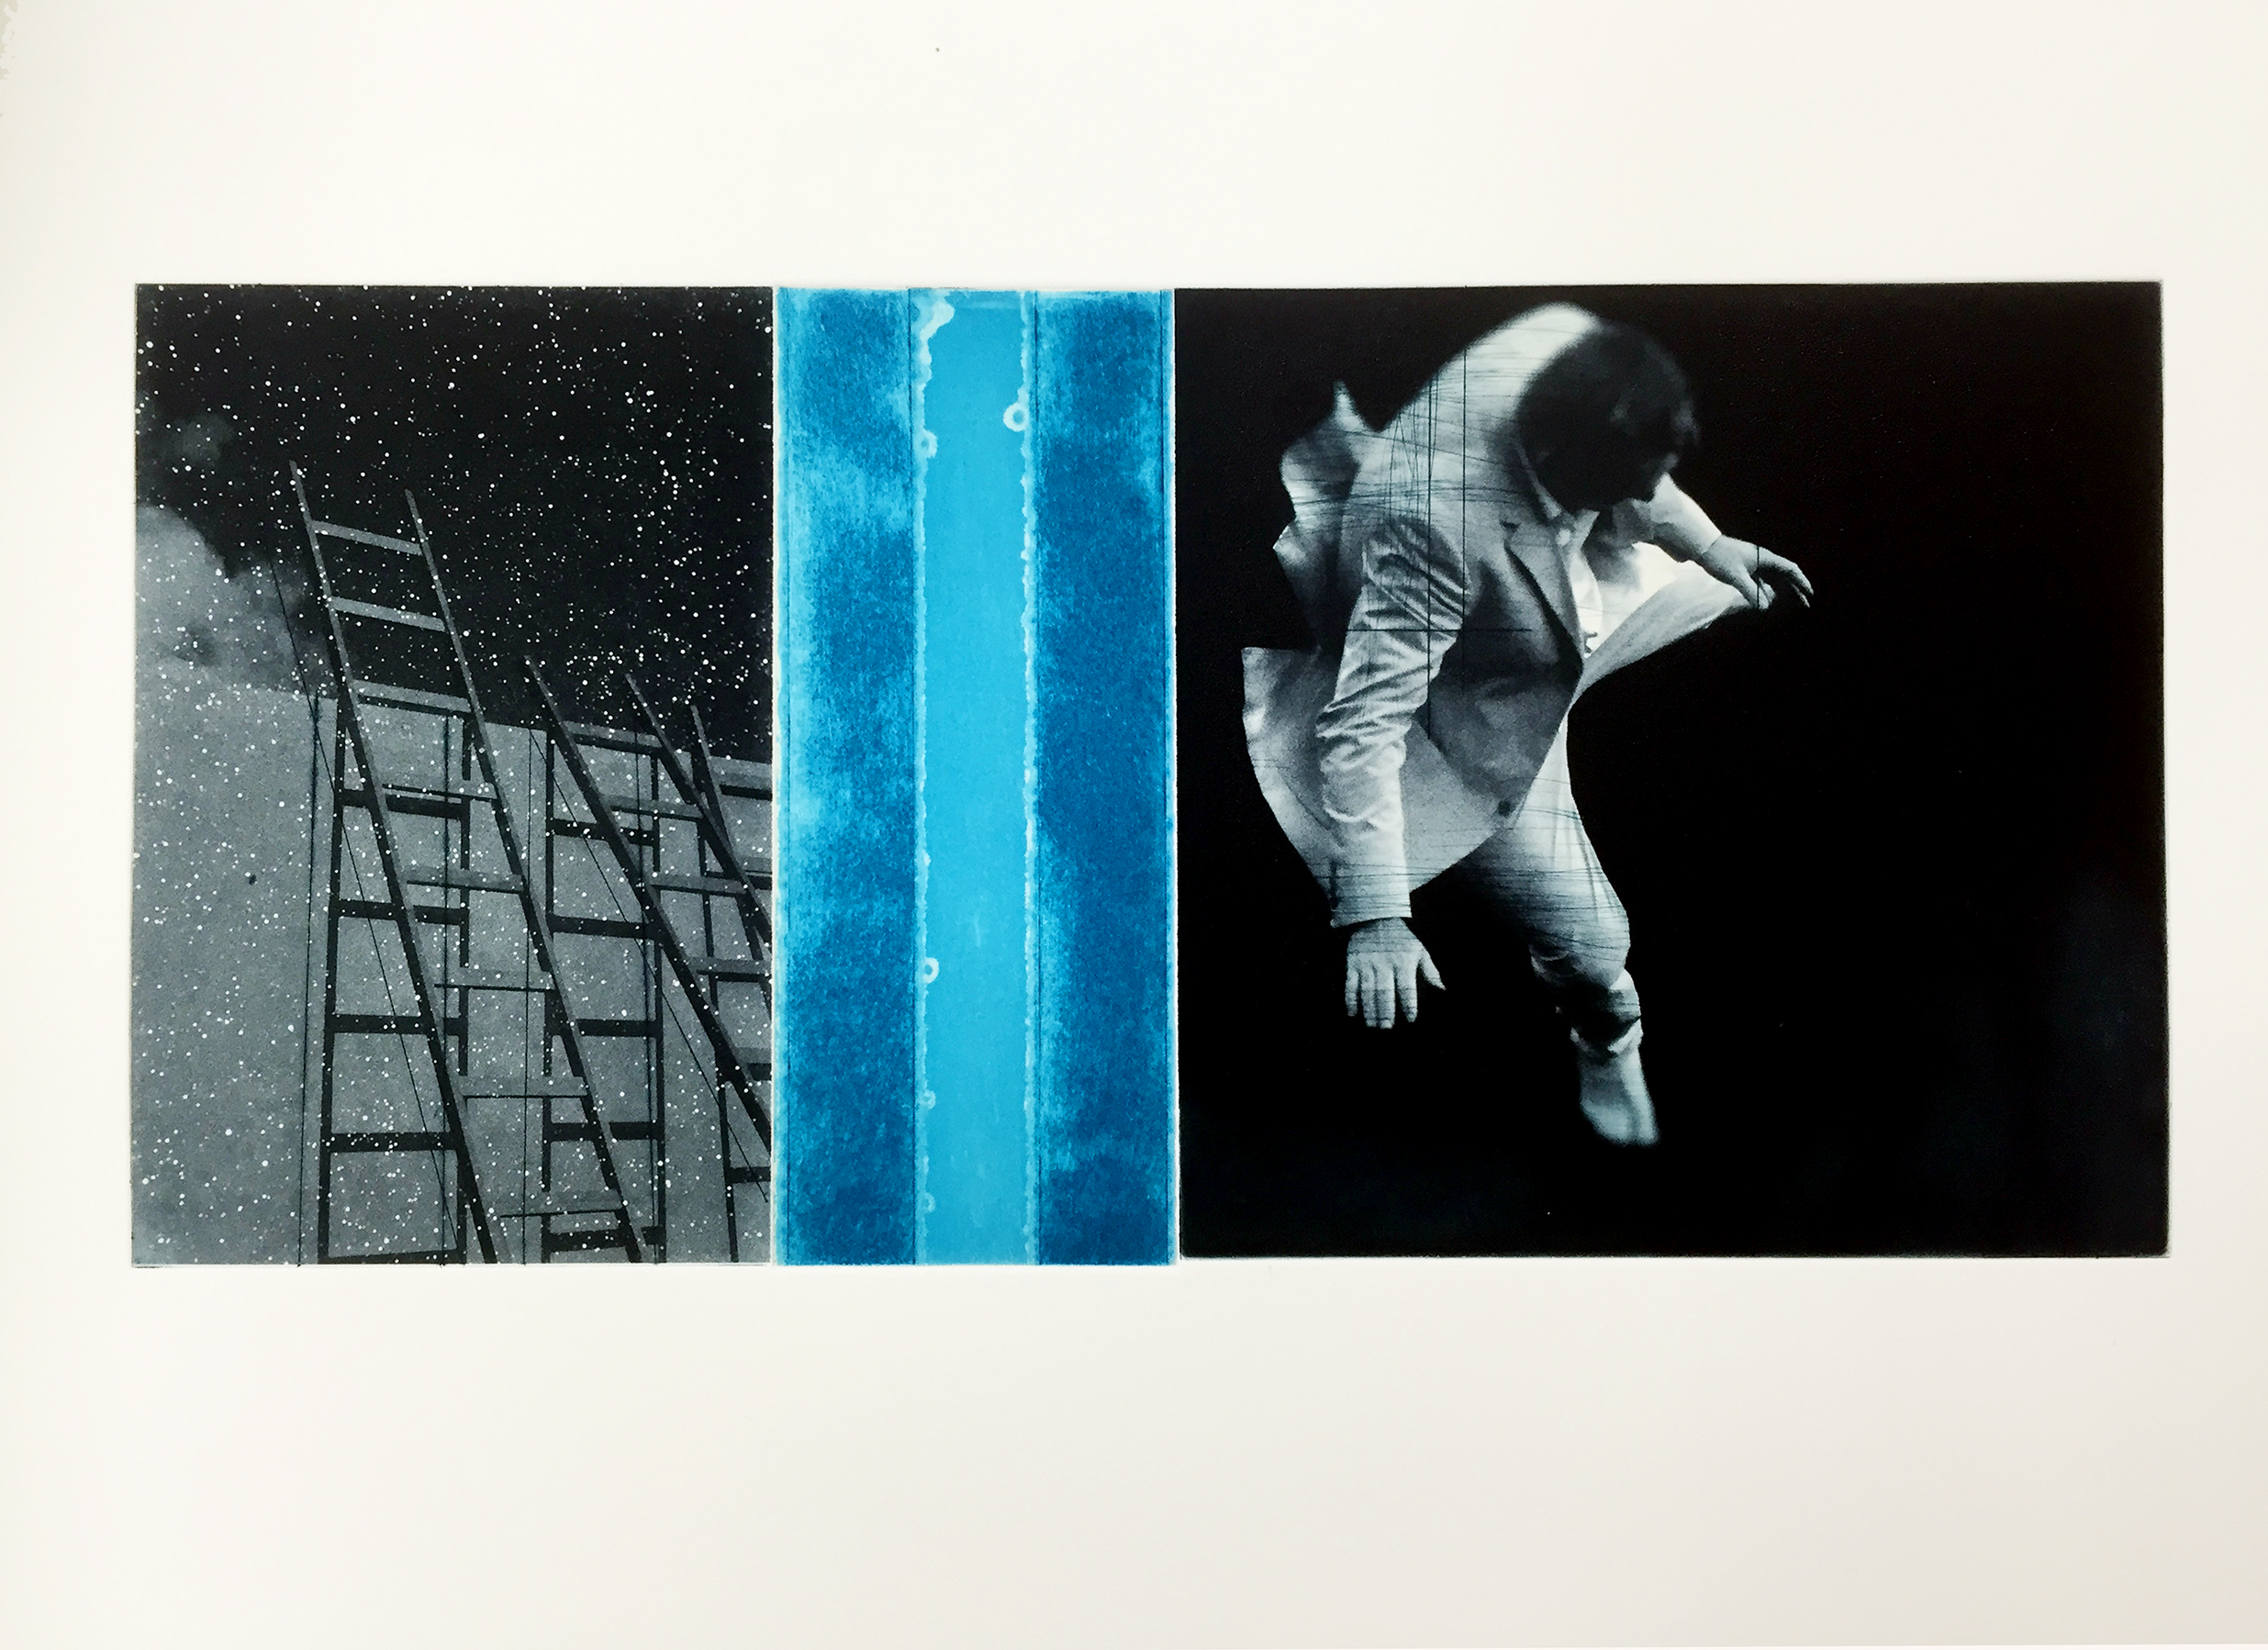 Gravity / Venia ( Joy ) Trampoline  Image size: 30 x 15 cm /Paper Size: 59 x 39 cm Drypoint / Photopolymer / Etching Edition of 40